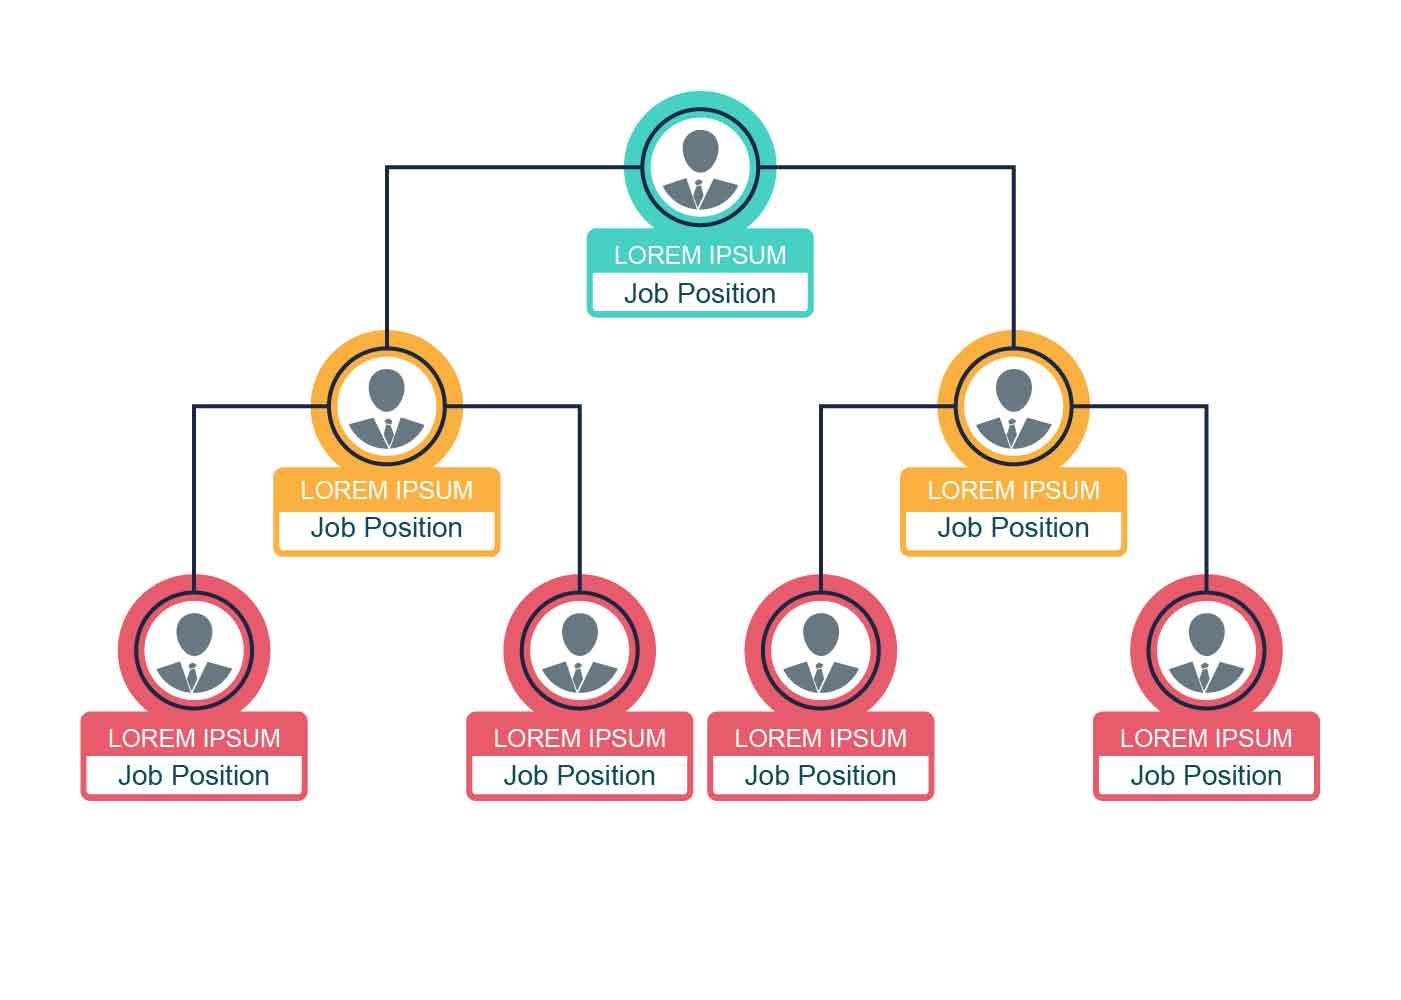 business organogram chart download free vector art